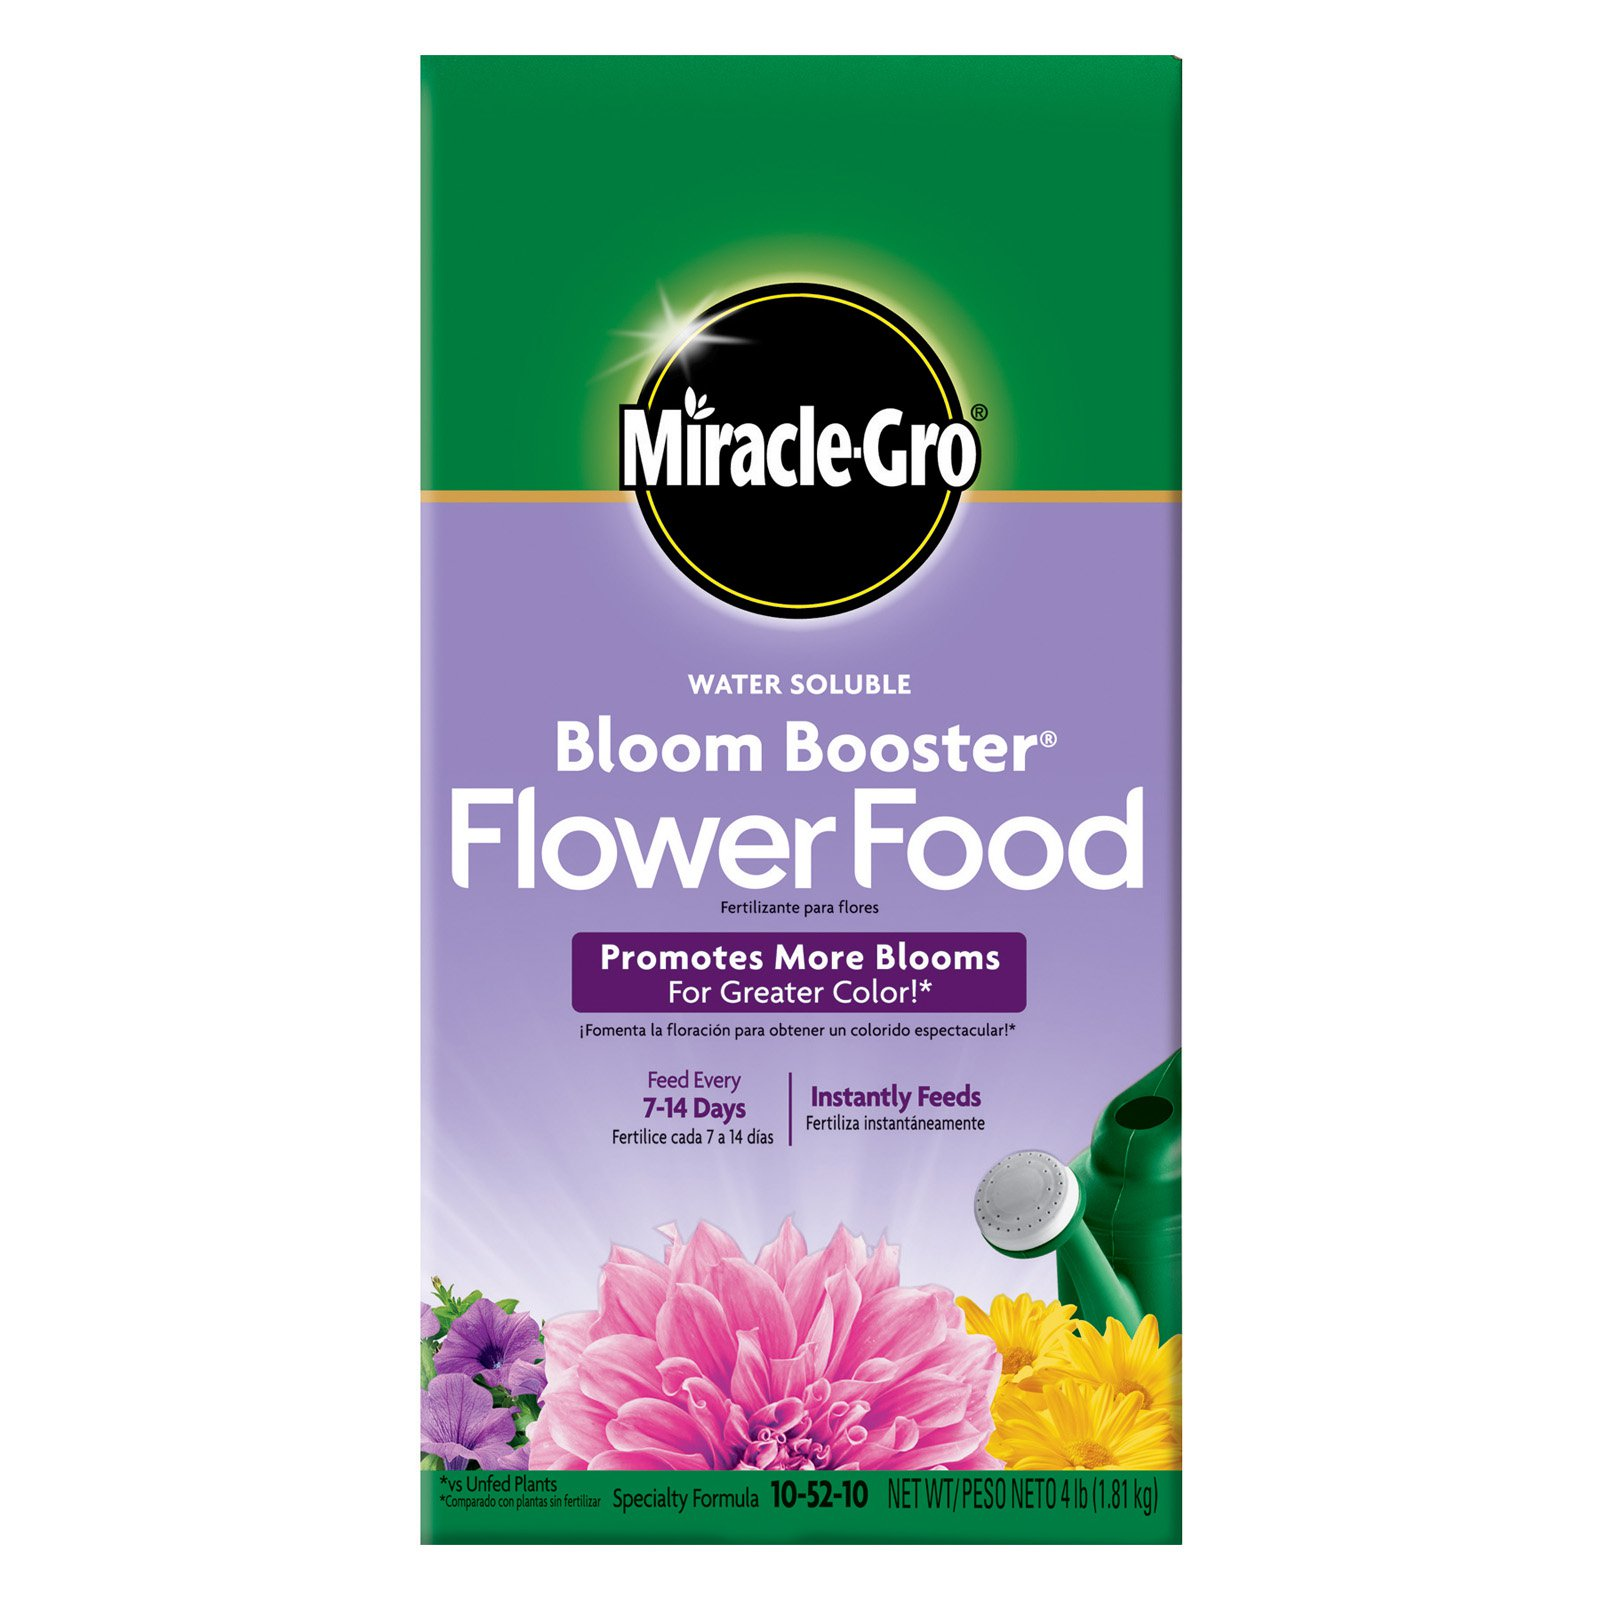 Miracle Gro Water Soluble Bloom Booster Flower Food